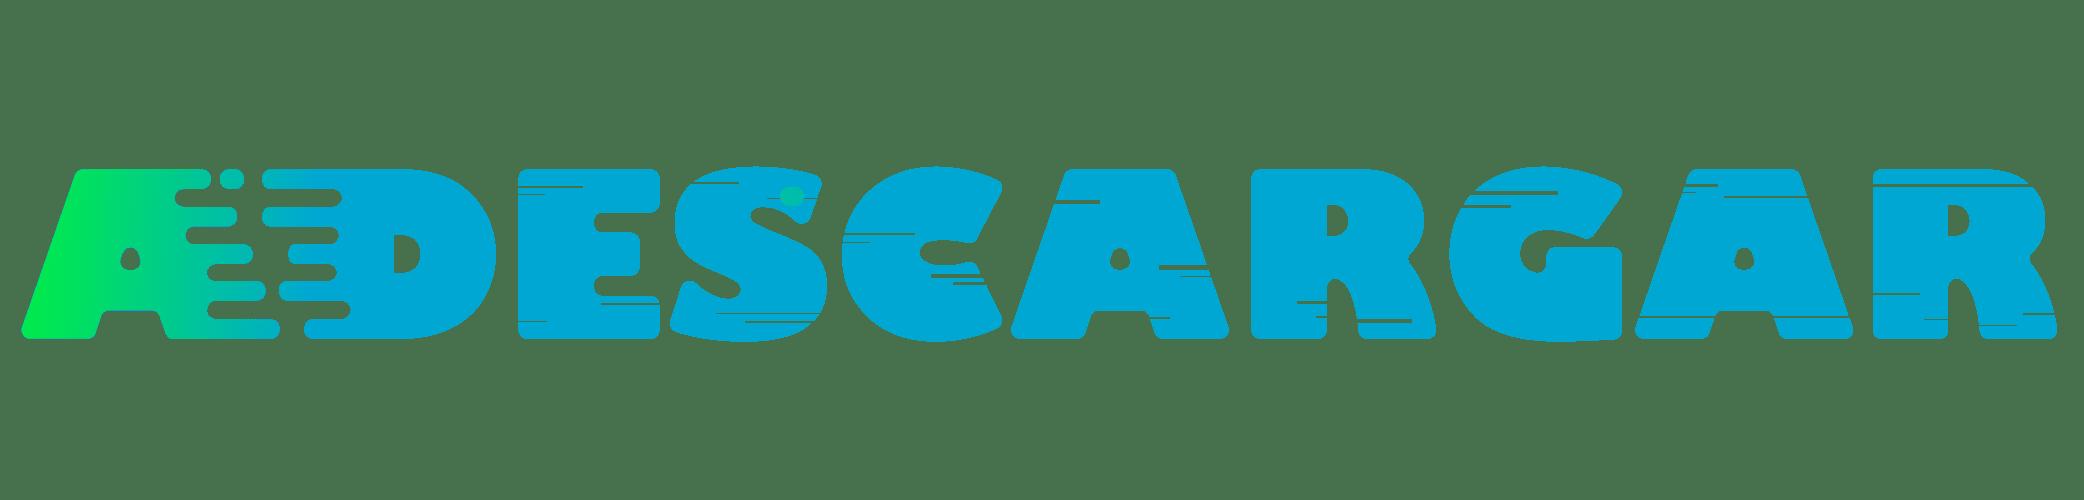 ADESCARGAR.Online